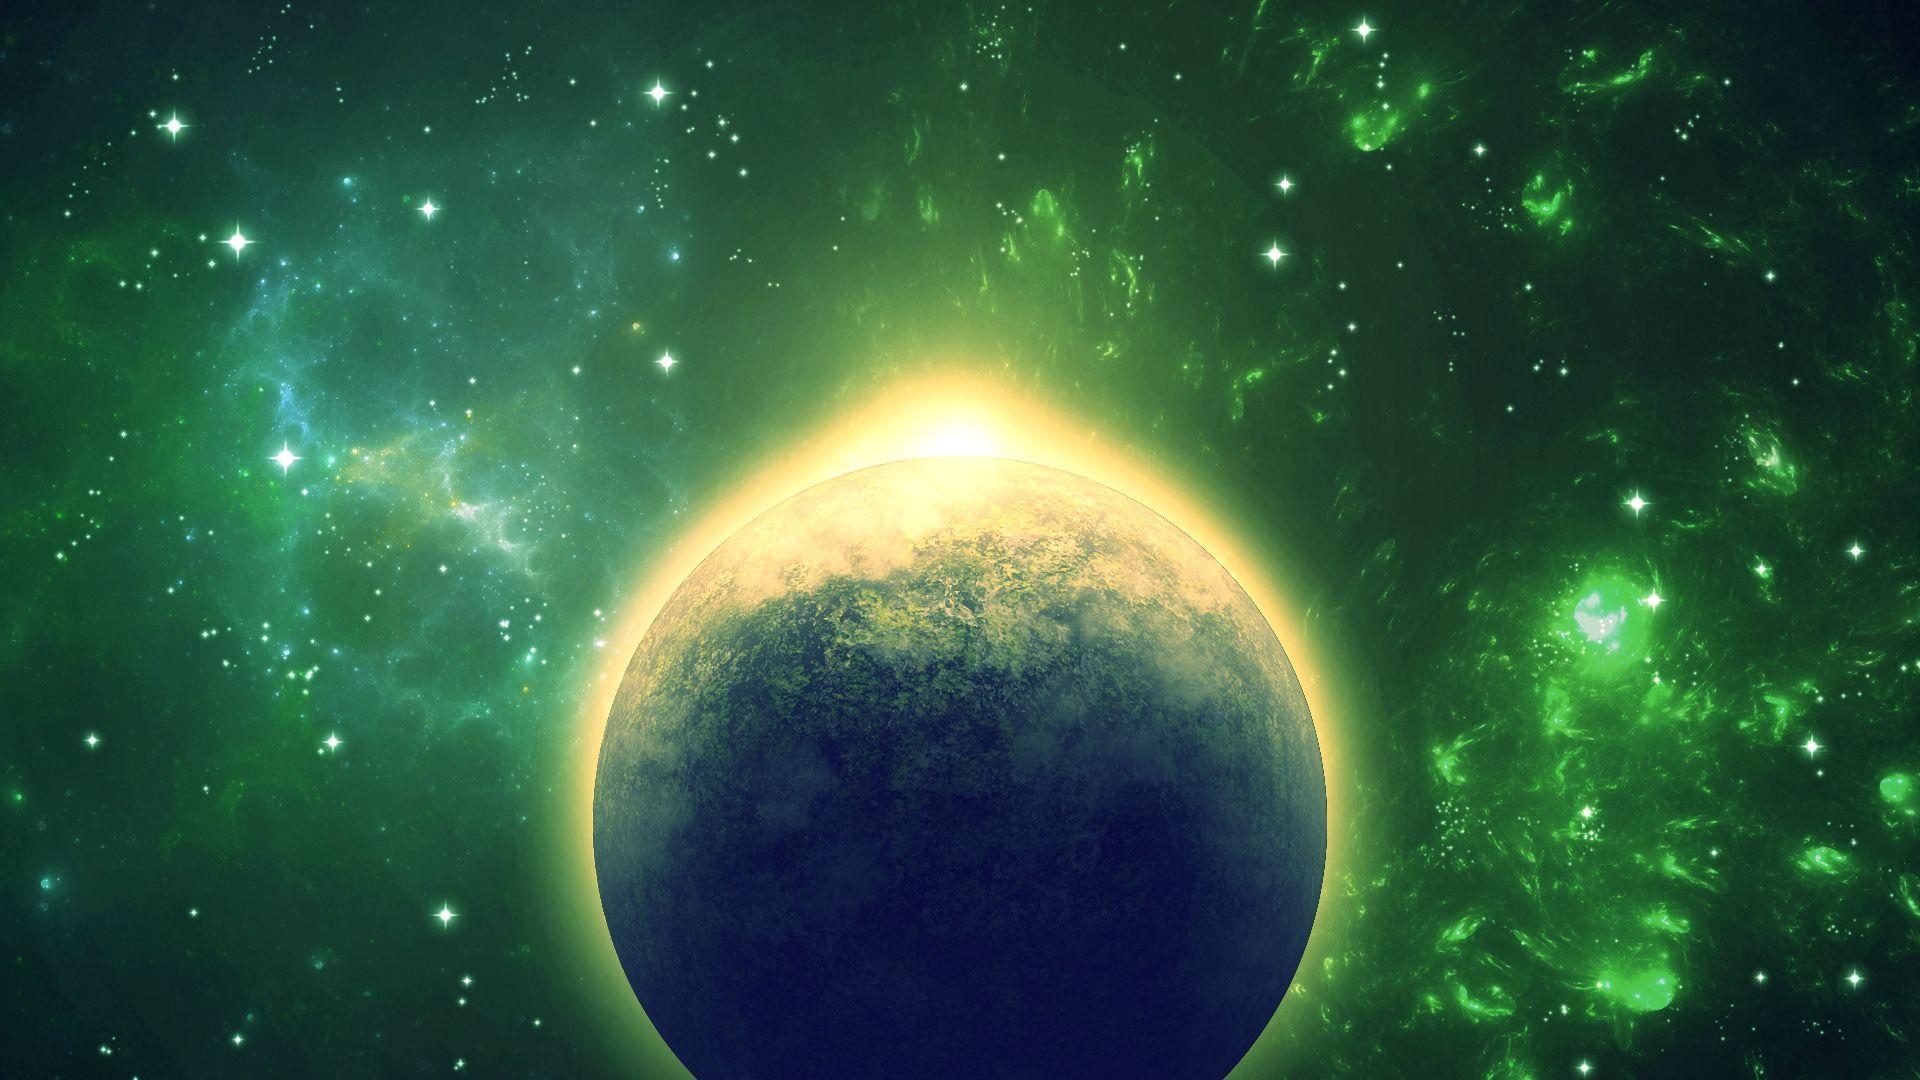 Alienware Logo Hd Wallpaper خلفيات خضراء عالية الوضوح للتحميل مجانا